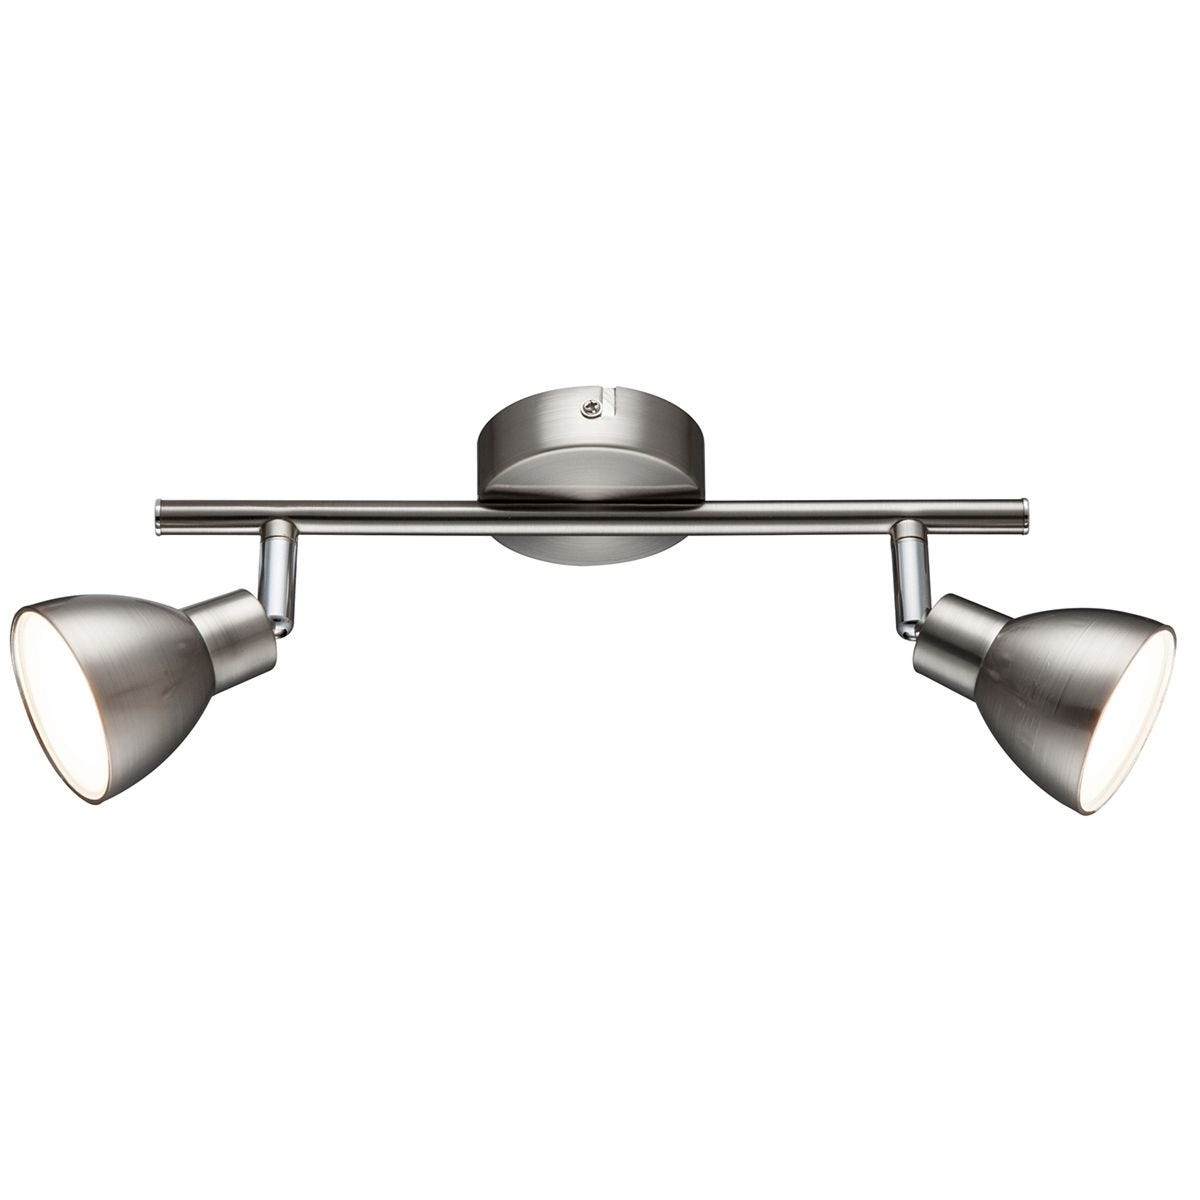 Action Lester Pendant Bar/Spot Light - Nickel Matt Finished/Chrome with 2 x LED Bulbs